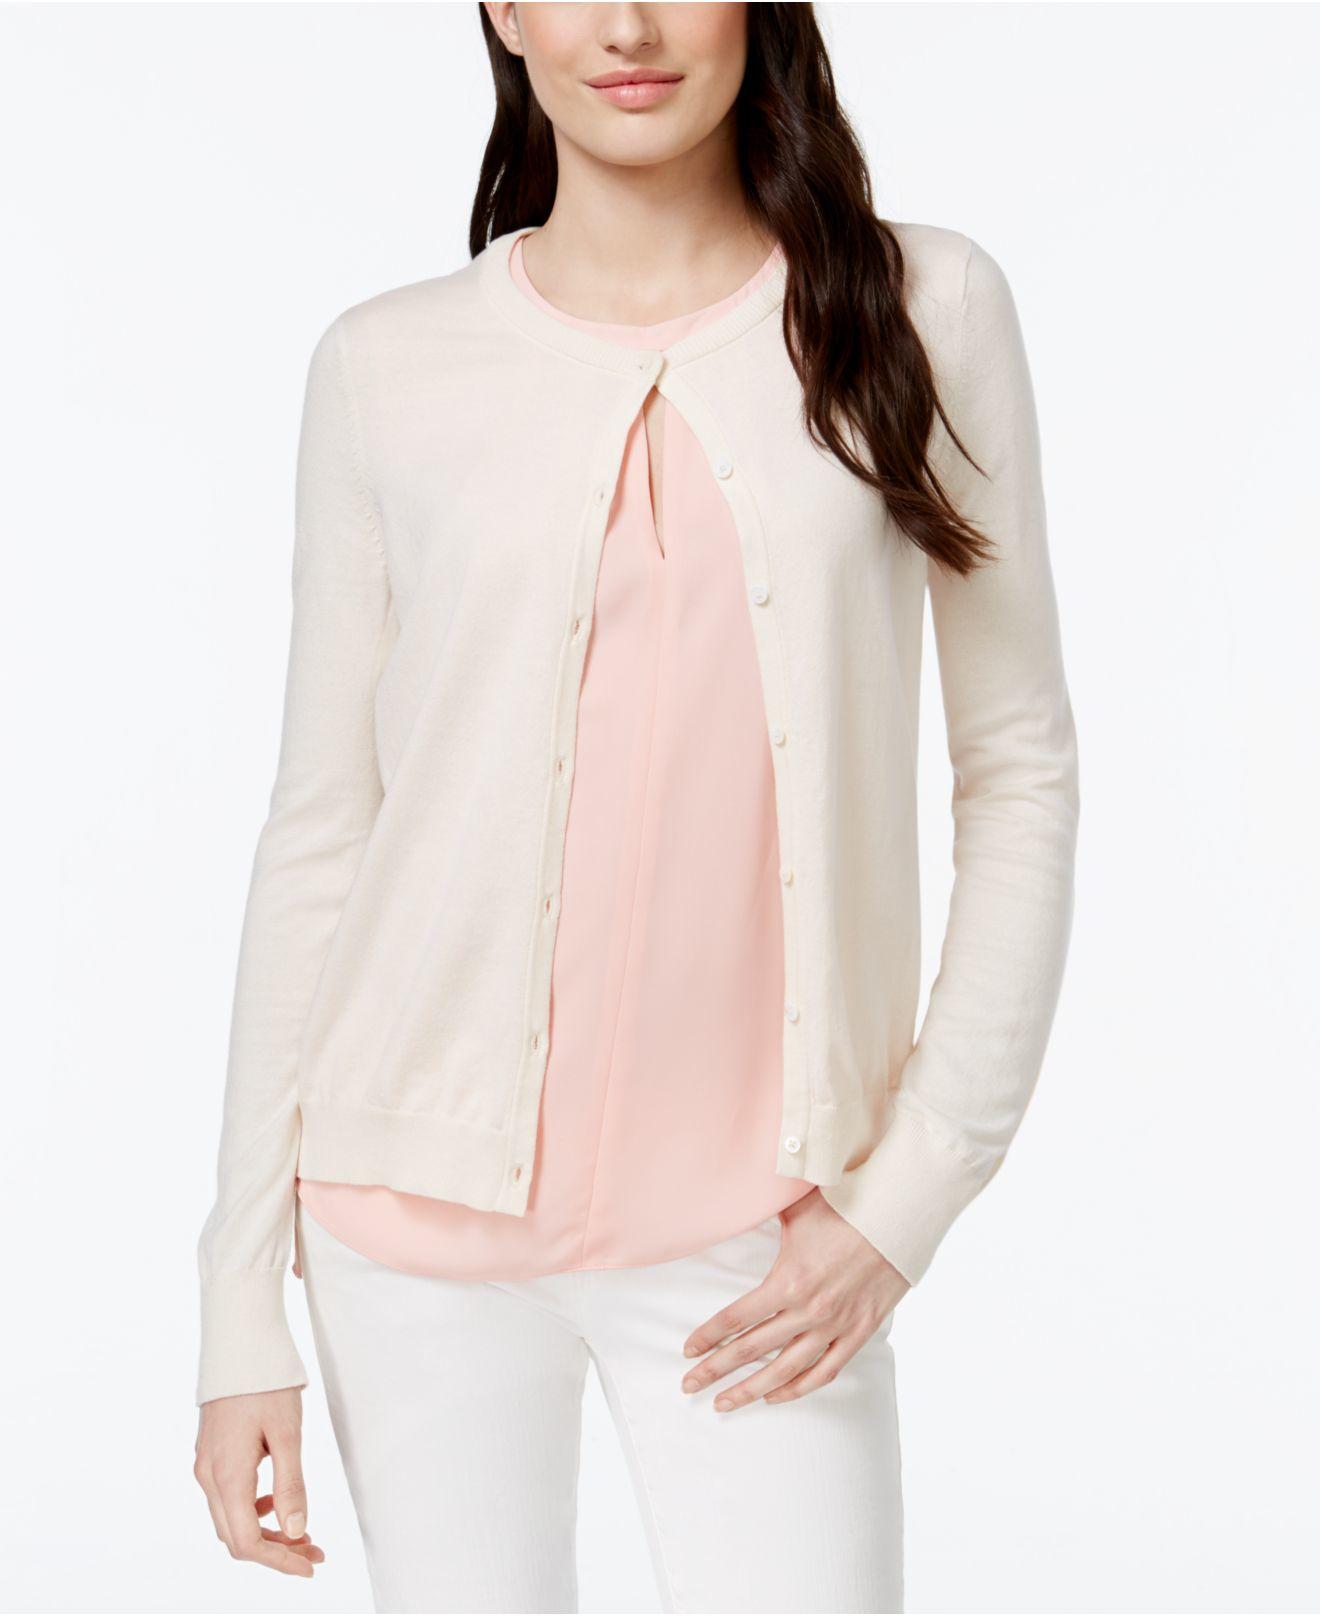 Cece by cynthia steffe Floral Chiffon-back Cardigan in Pink | Lyst